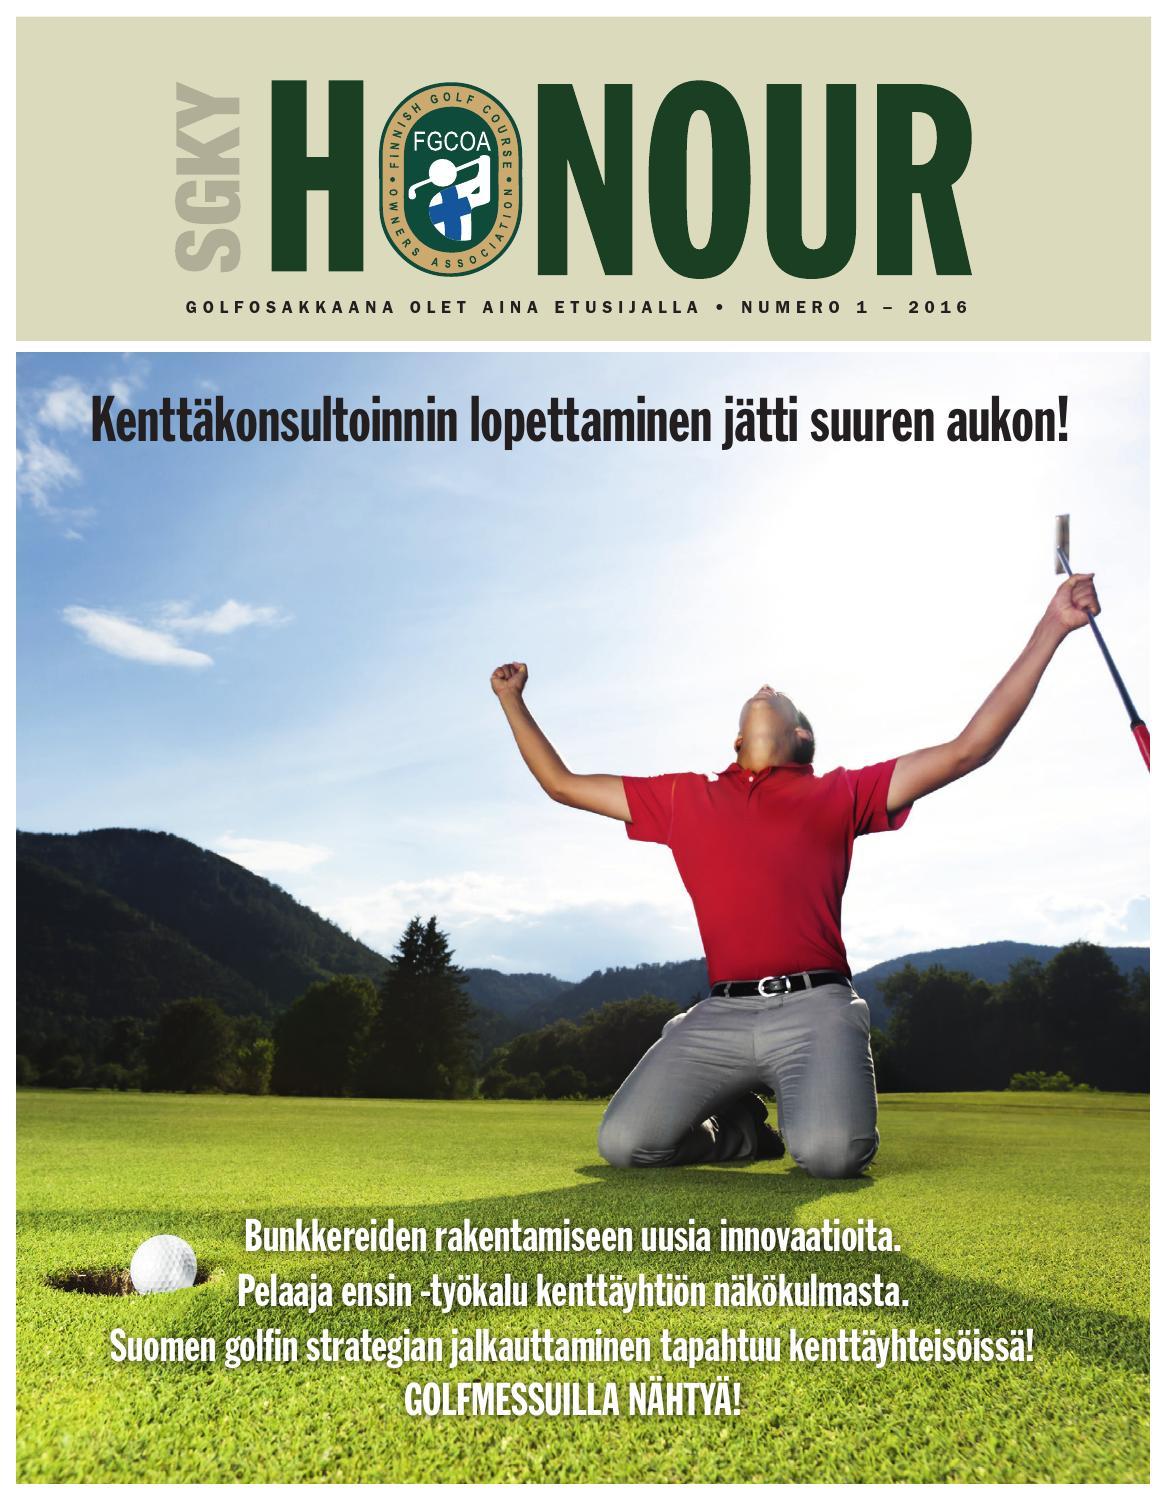 fgcoa honour magazine 1 2016 by jukka rimpiläinen issuu